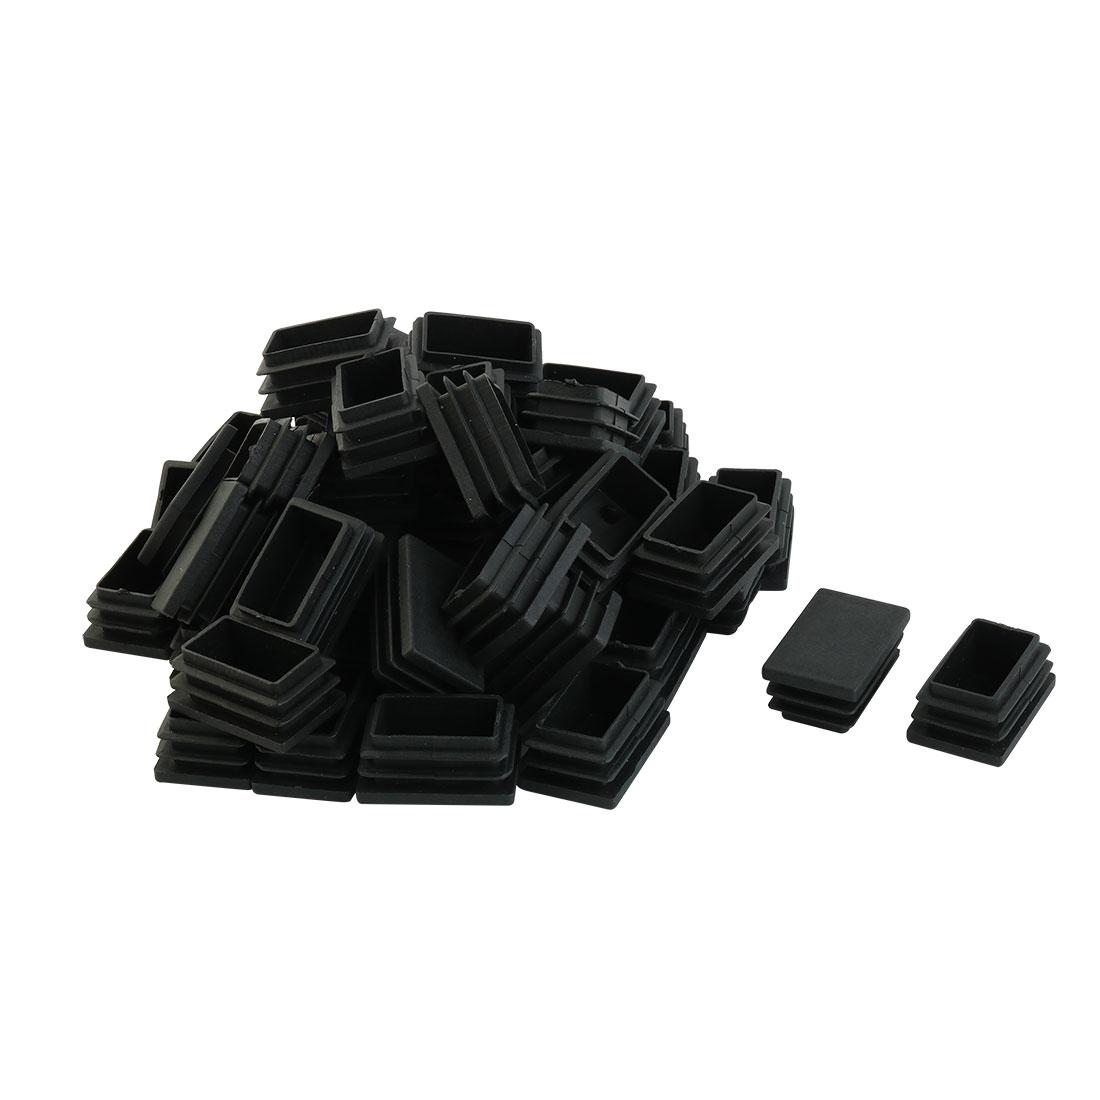 Home Plastic Rectangular Shaped Furniture Table Chair Leg Feet Tube Insert Black 50 Pcs